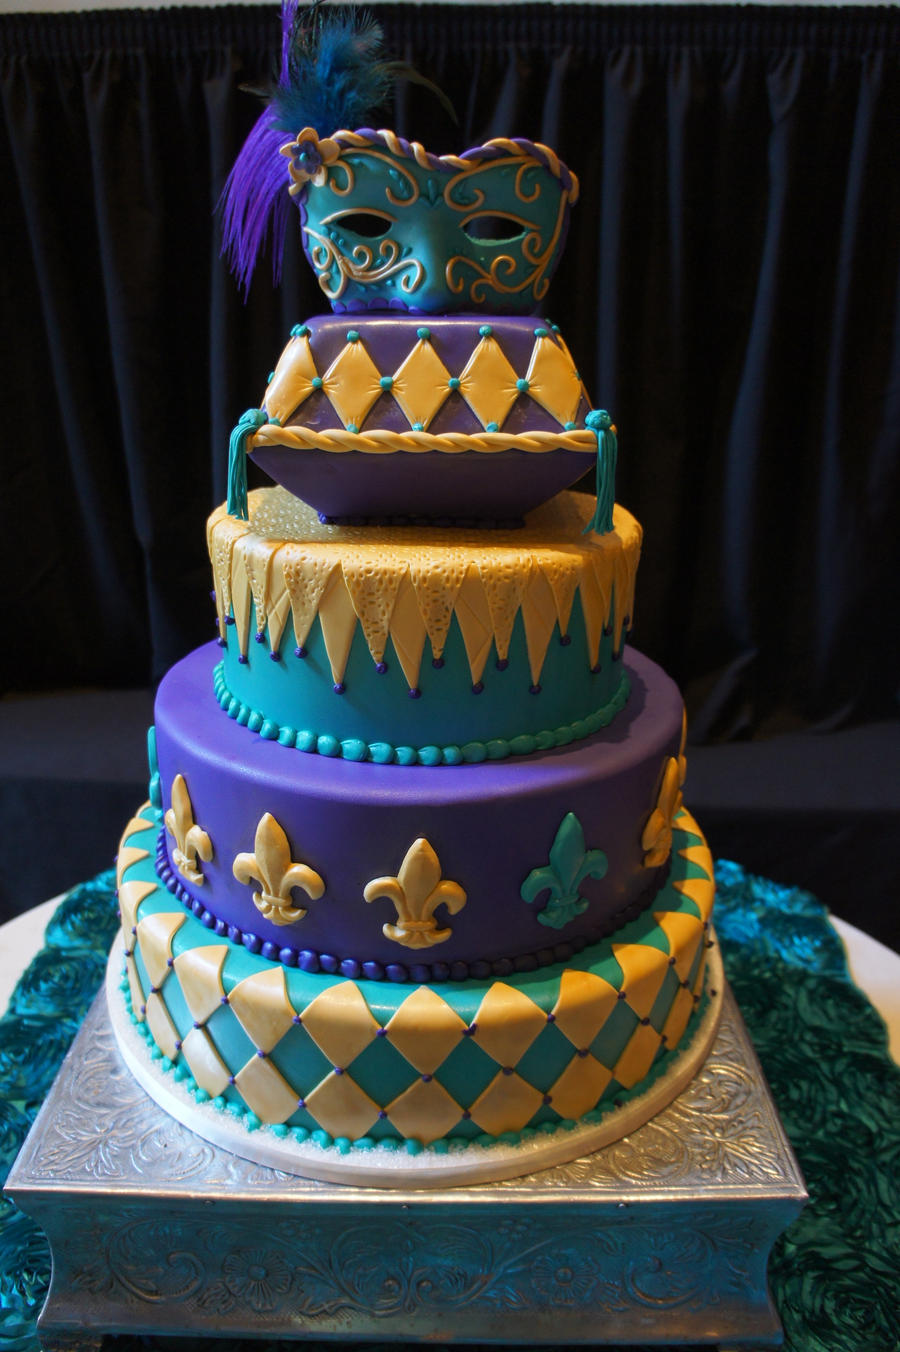 masquerade cake by ninny85310